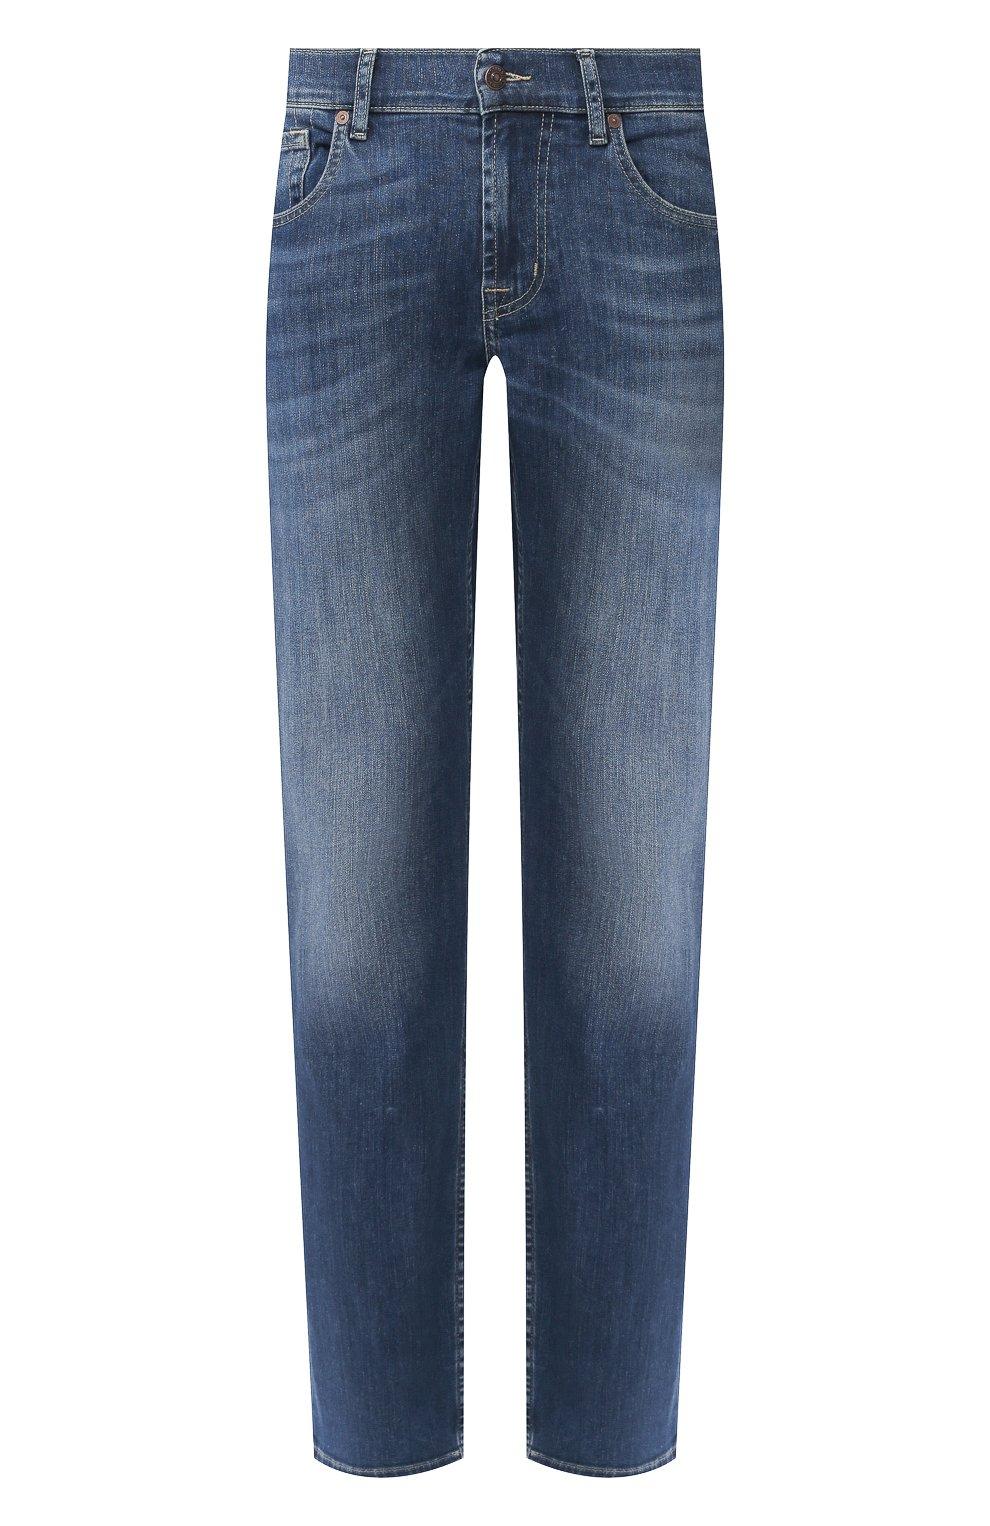 Мужские джинсы 7 FOR ALL MANKIND синего цвета, арт. JSMSU250MX   Фото 1